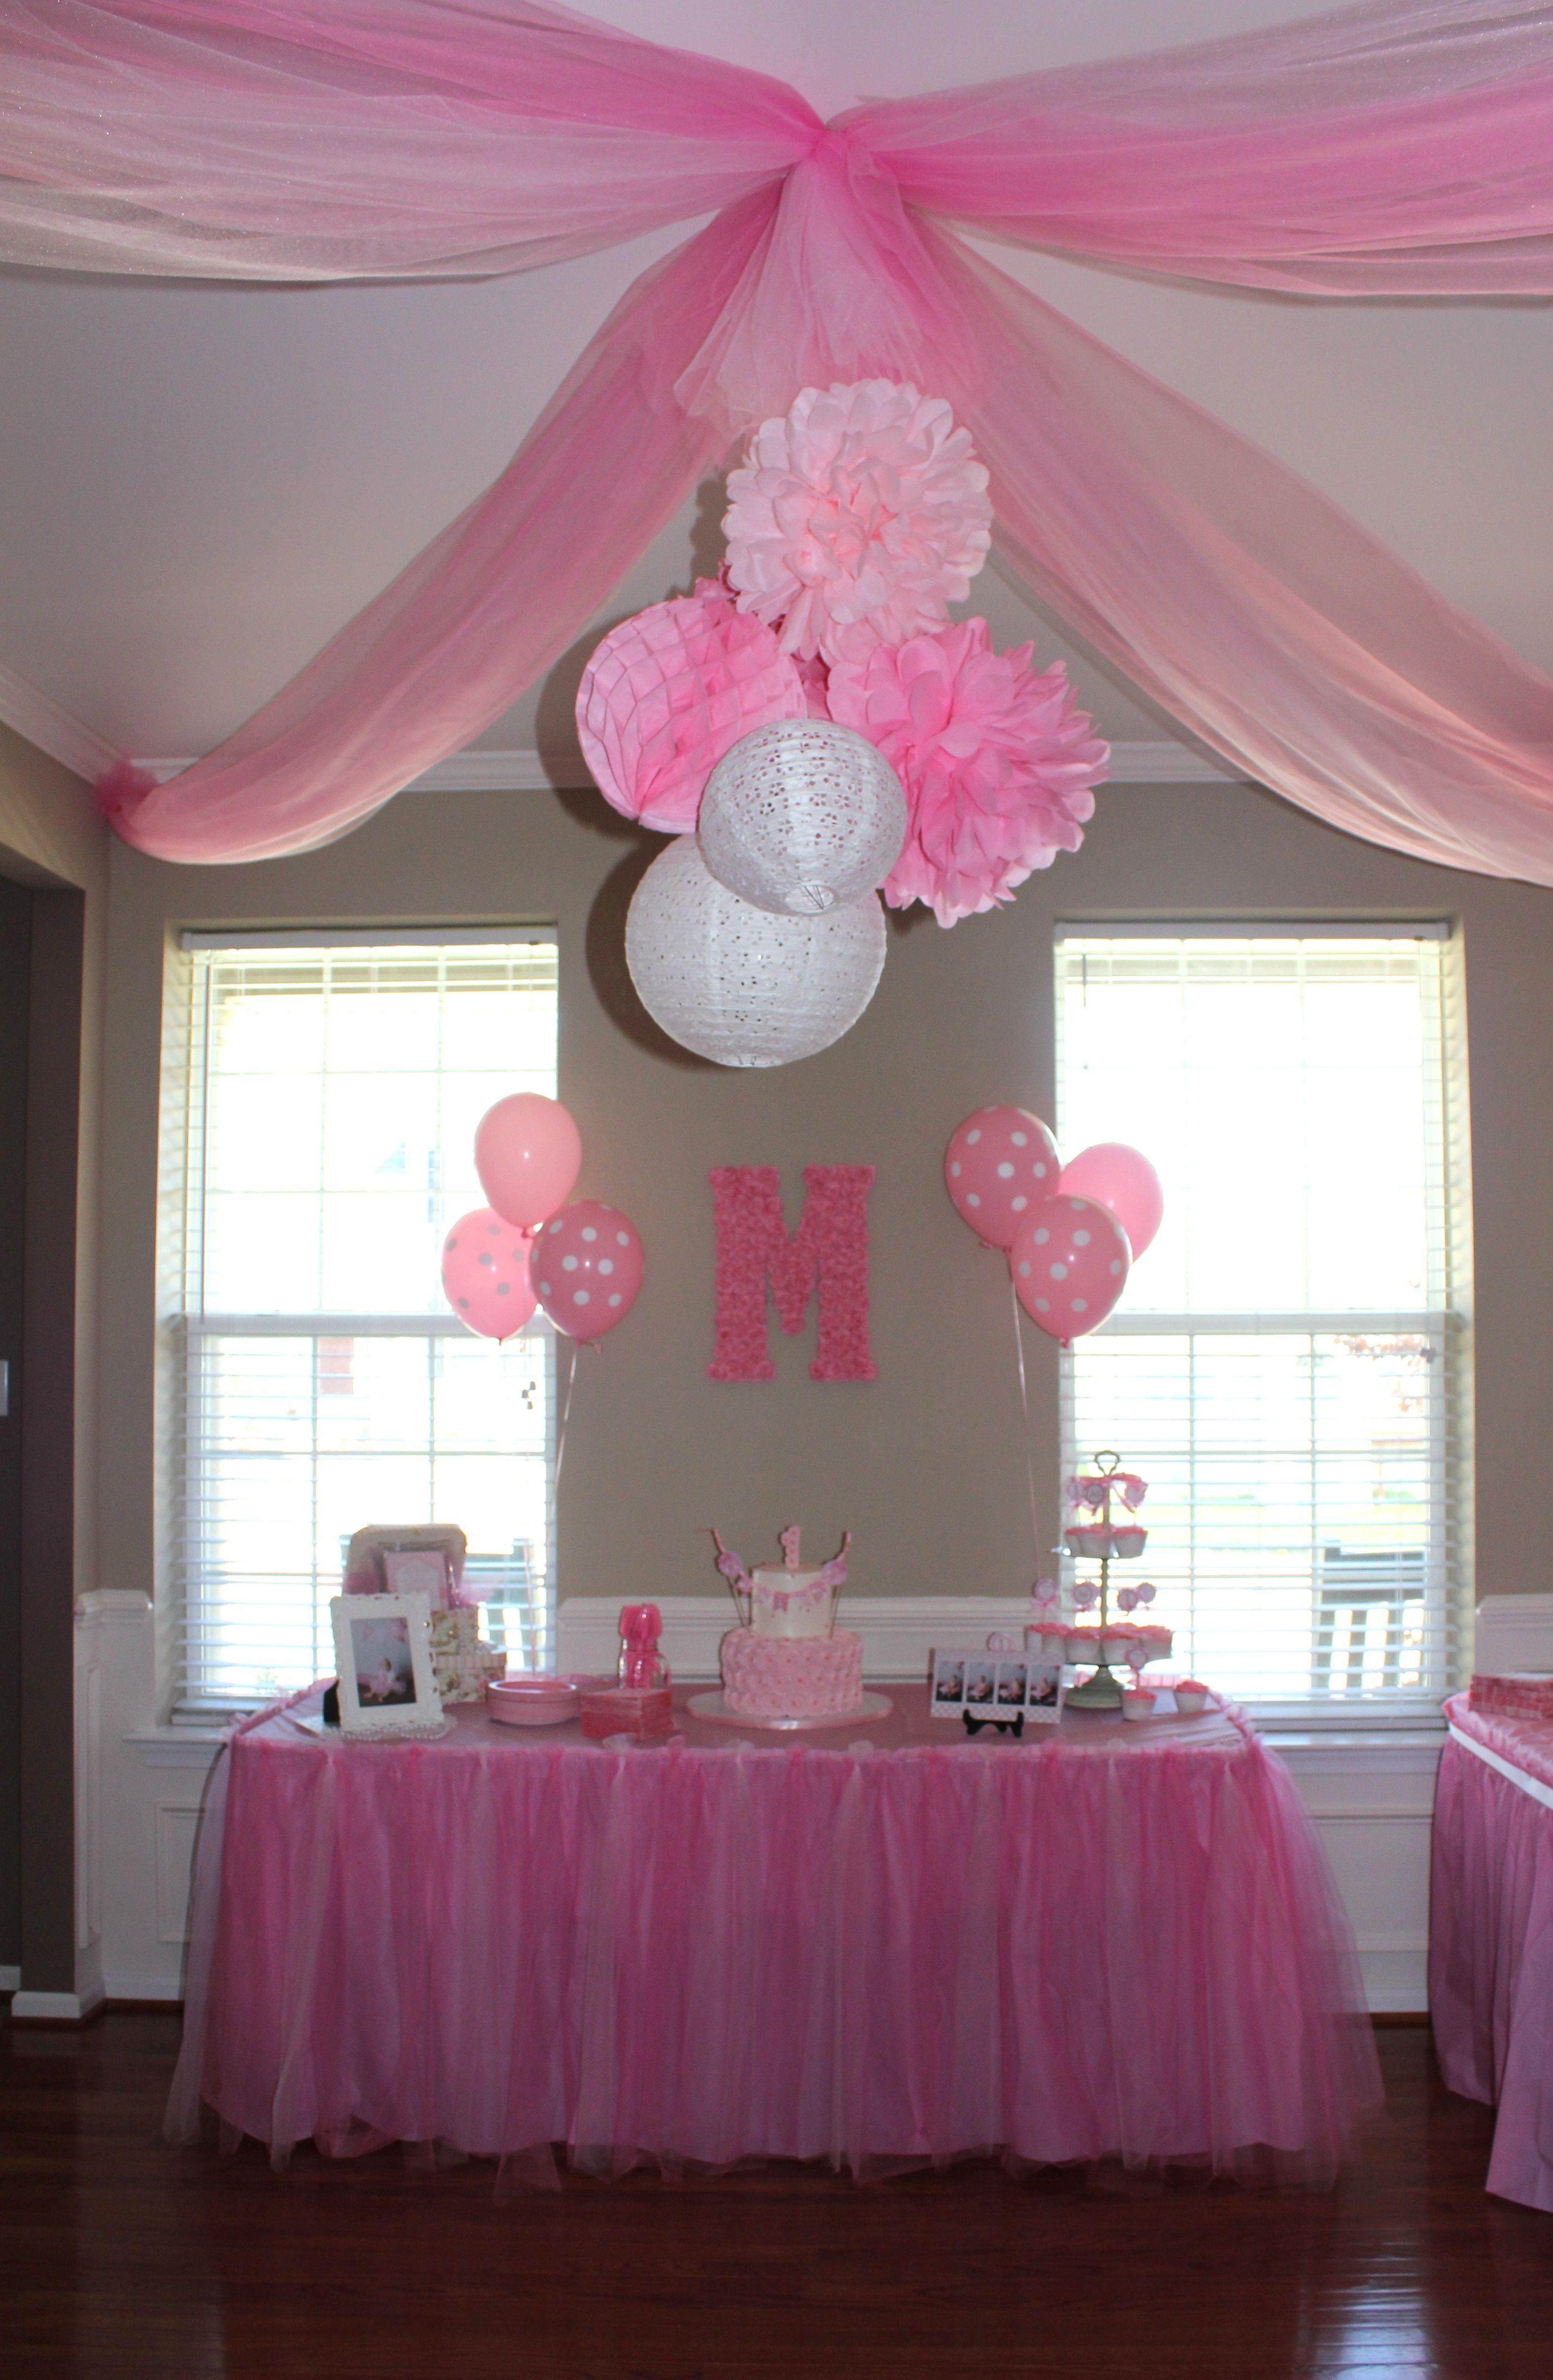 Pink Party 3 Tissue Paper Pom Poms 3 Paper Lanterns